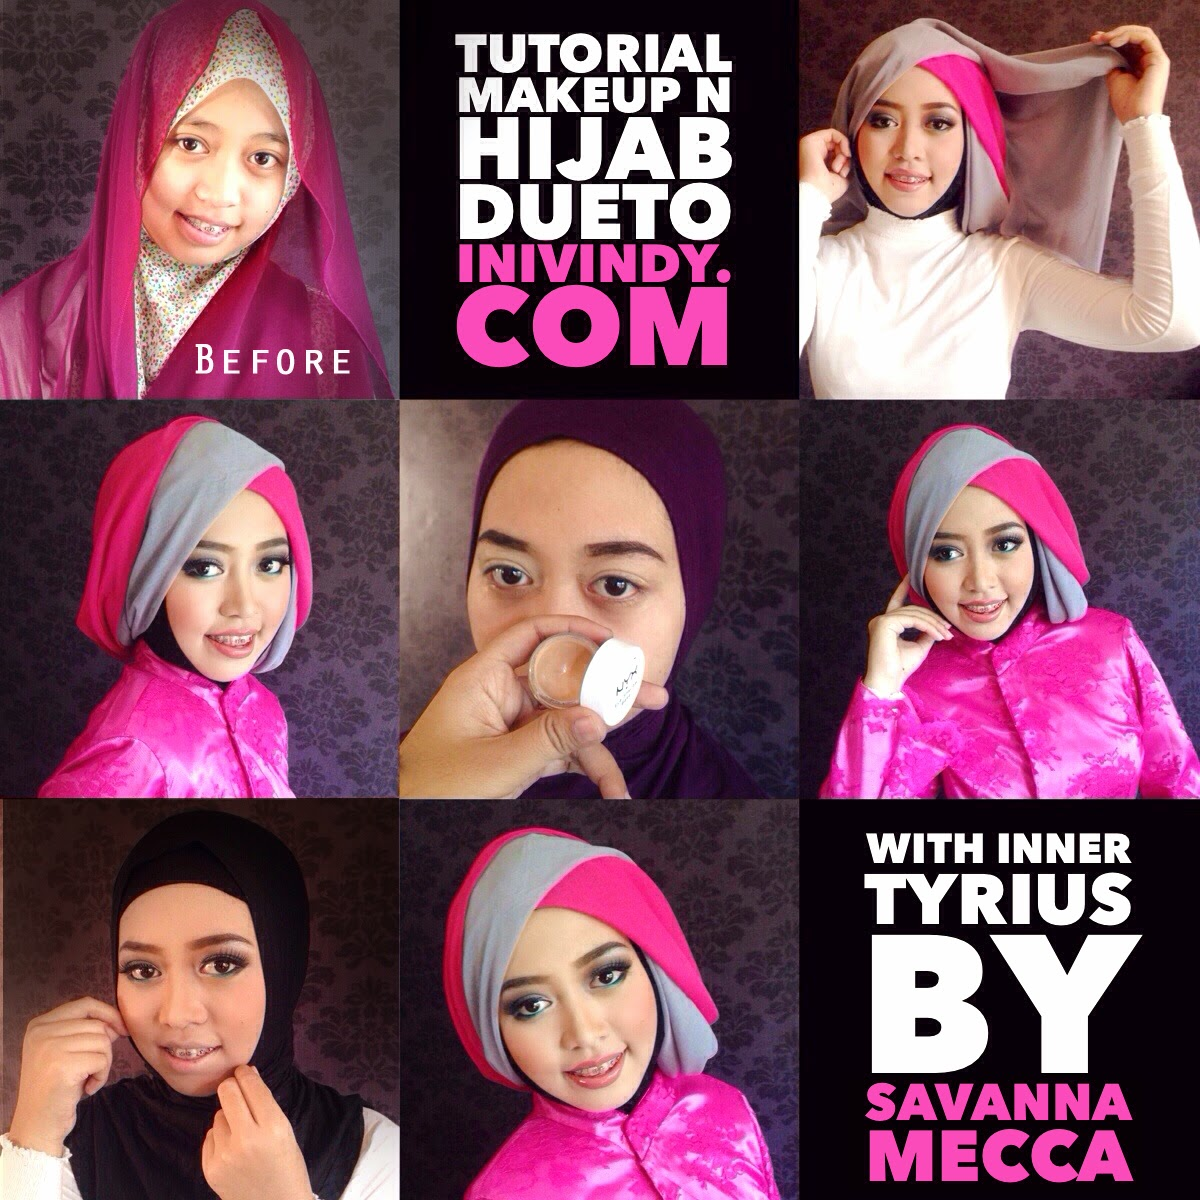 http://www.inivindy.com/2014/06/dueto-hijab-tutorial-menggunakan-inner.html